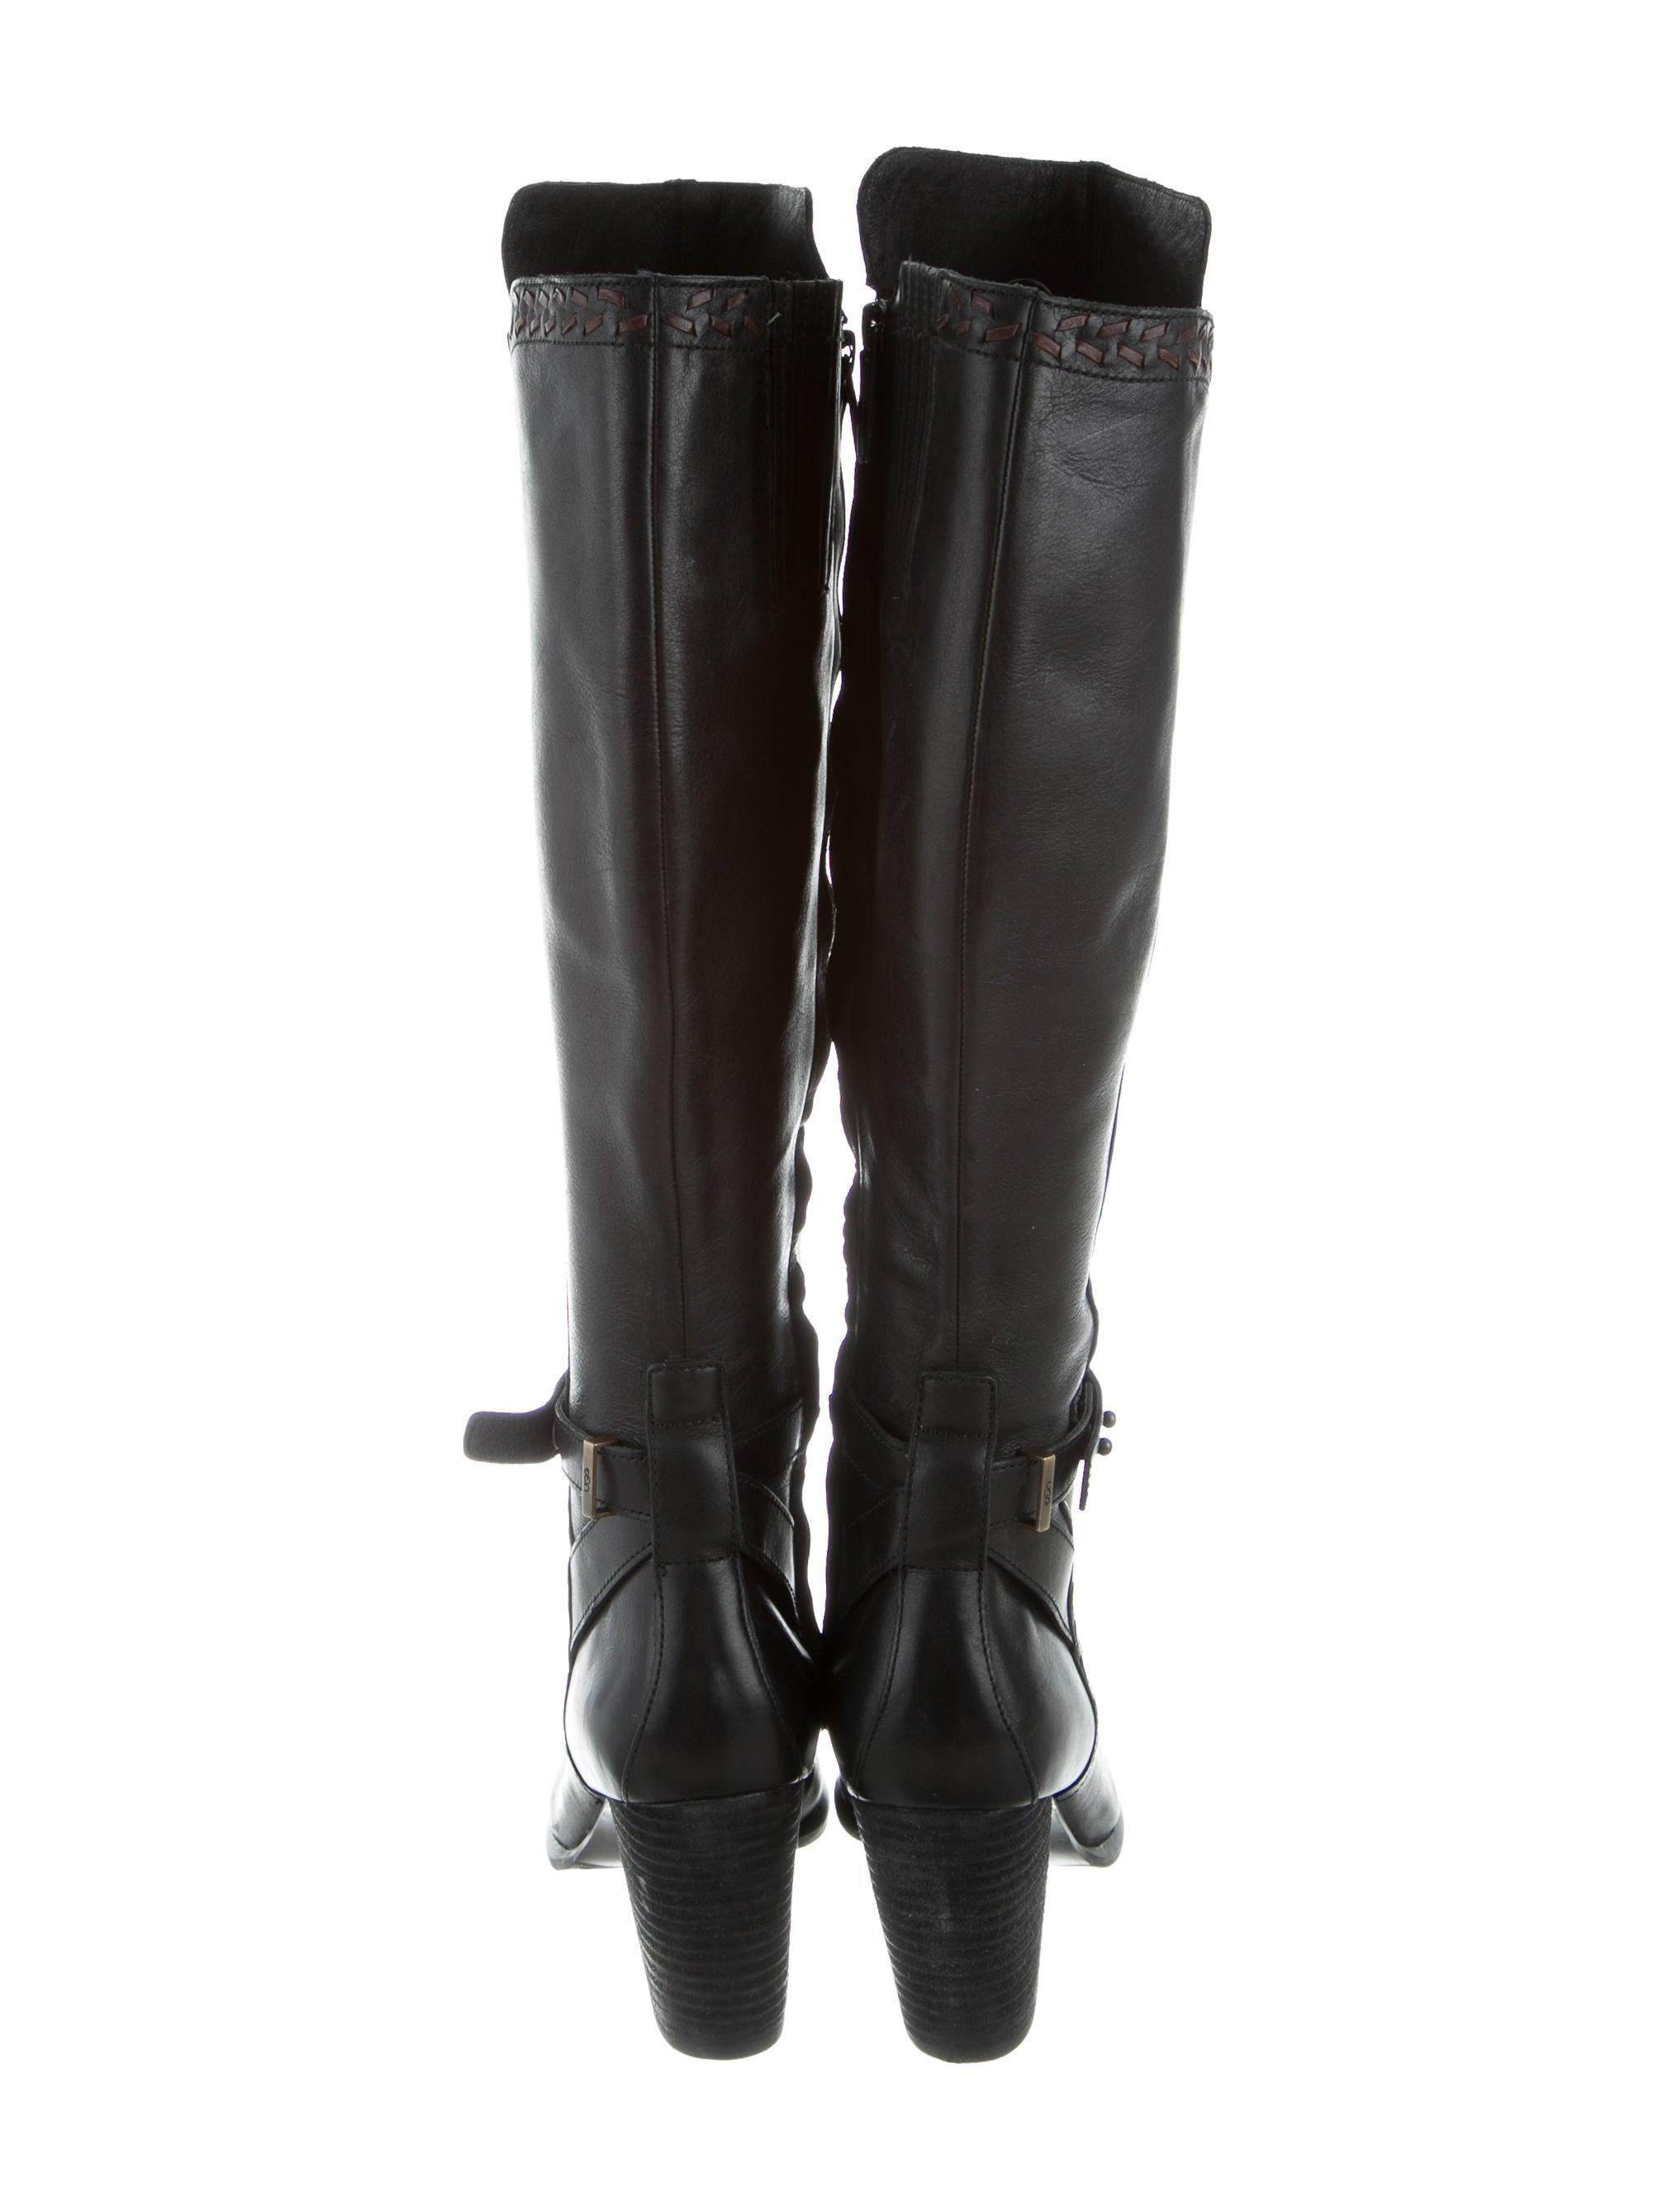 ugg australia leather knee high boots shoes wuugg21947